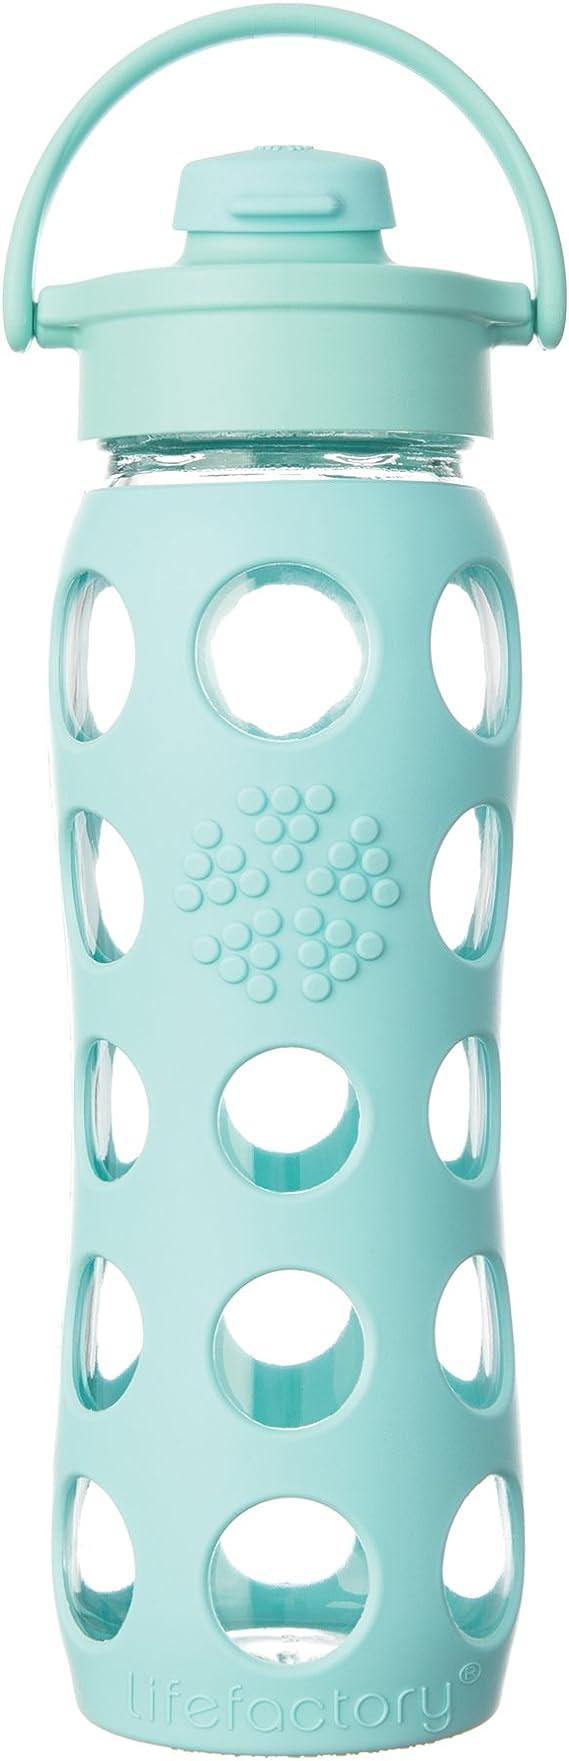 Lifefactory - Botella de cristal (con tapa con bisagra, 650 ml ...